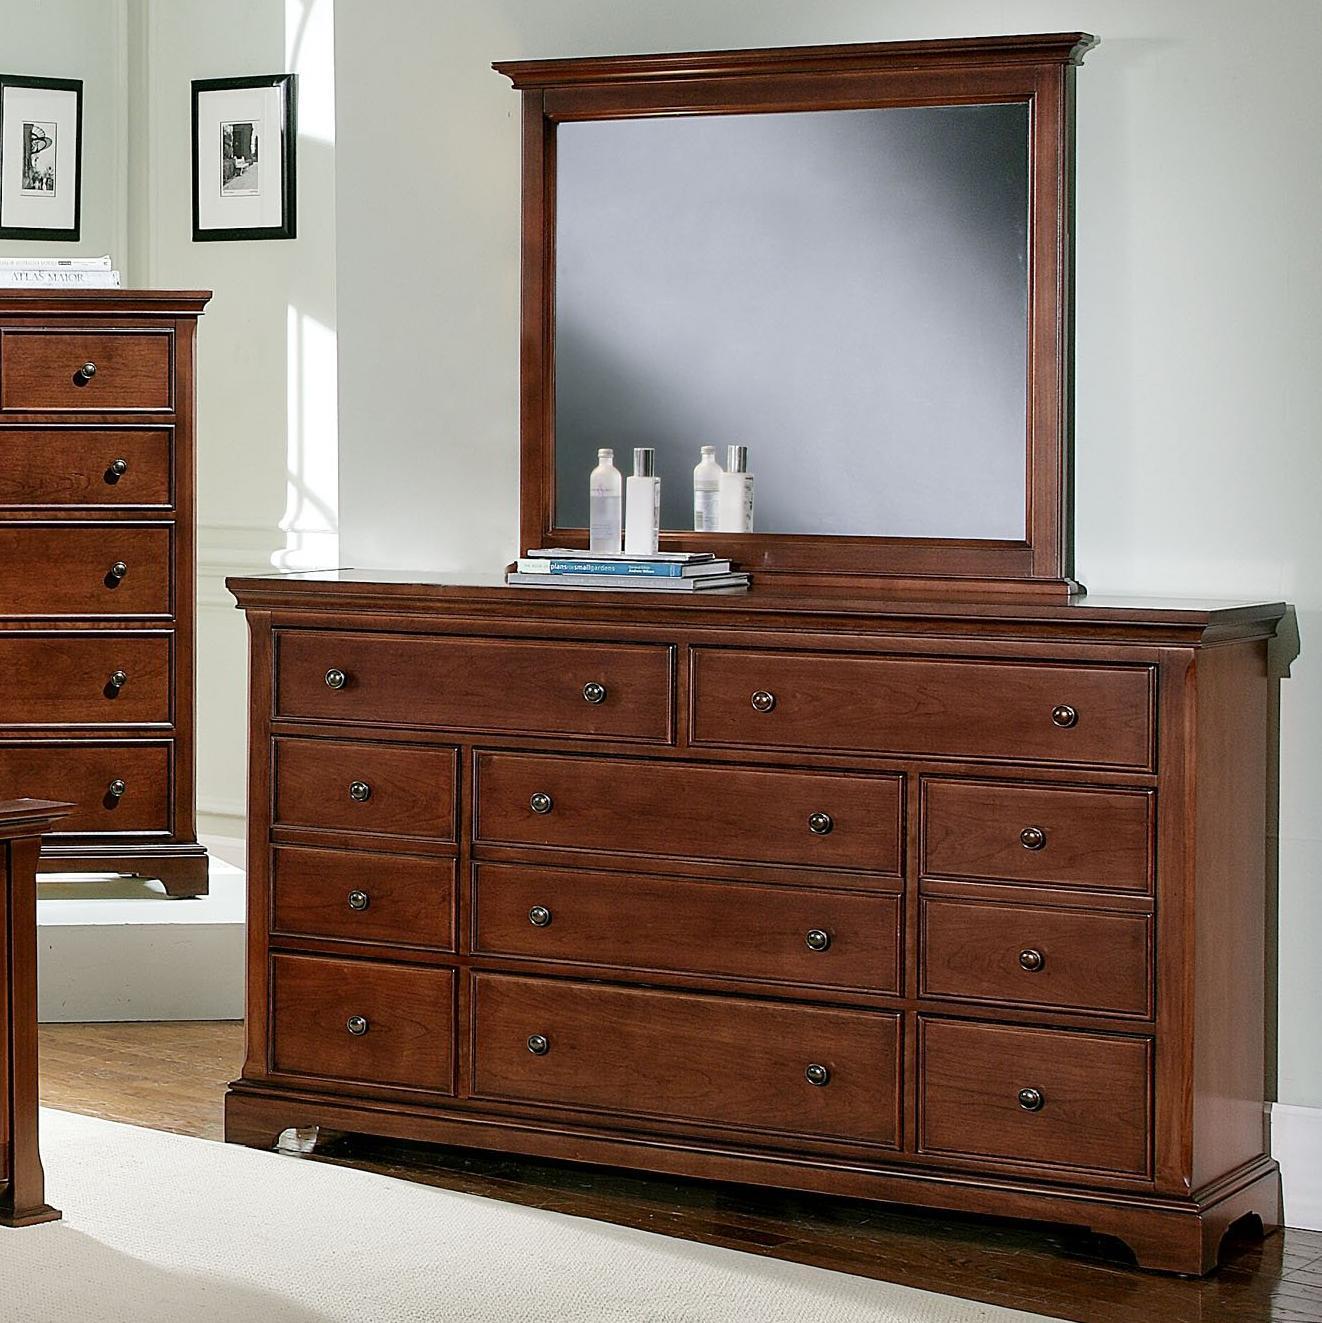 Vaughan Bassett Forsyth 8 Drawer Dresser and Mirror - Item Number: BB77-003+446